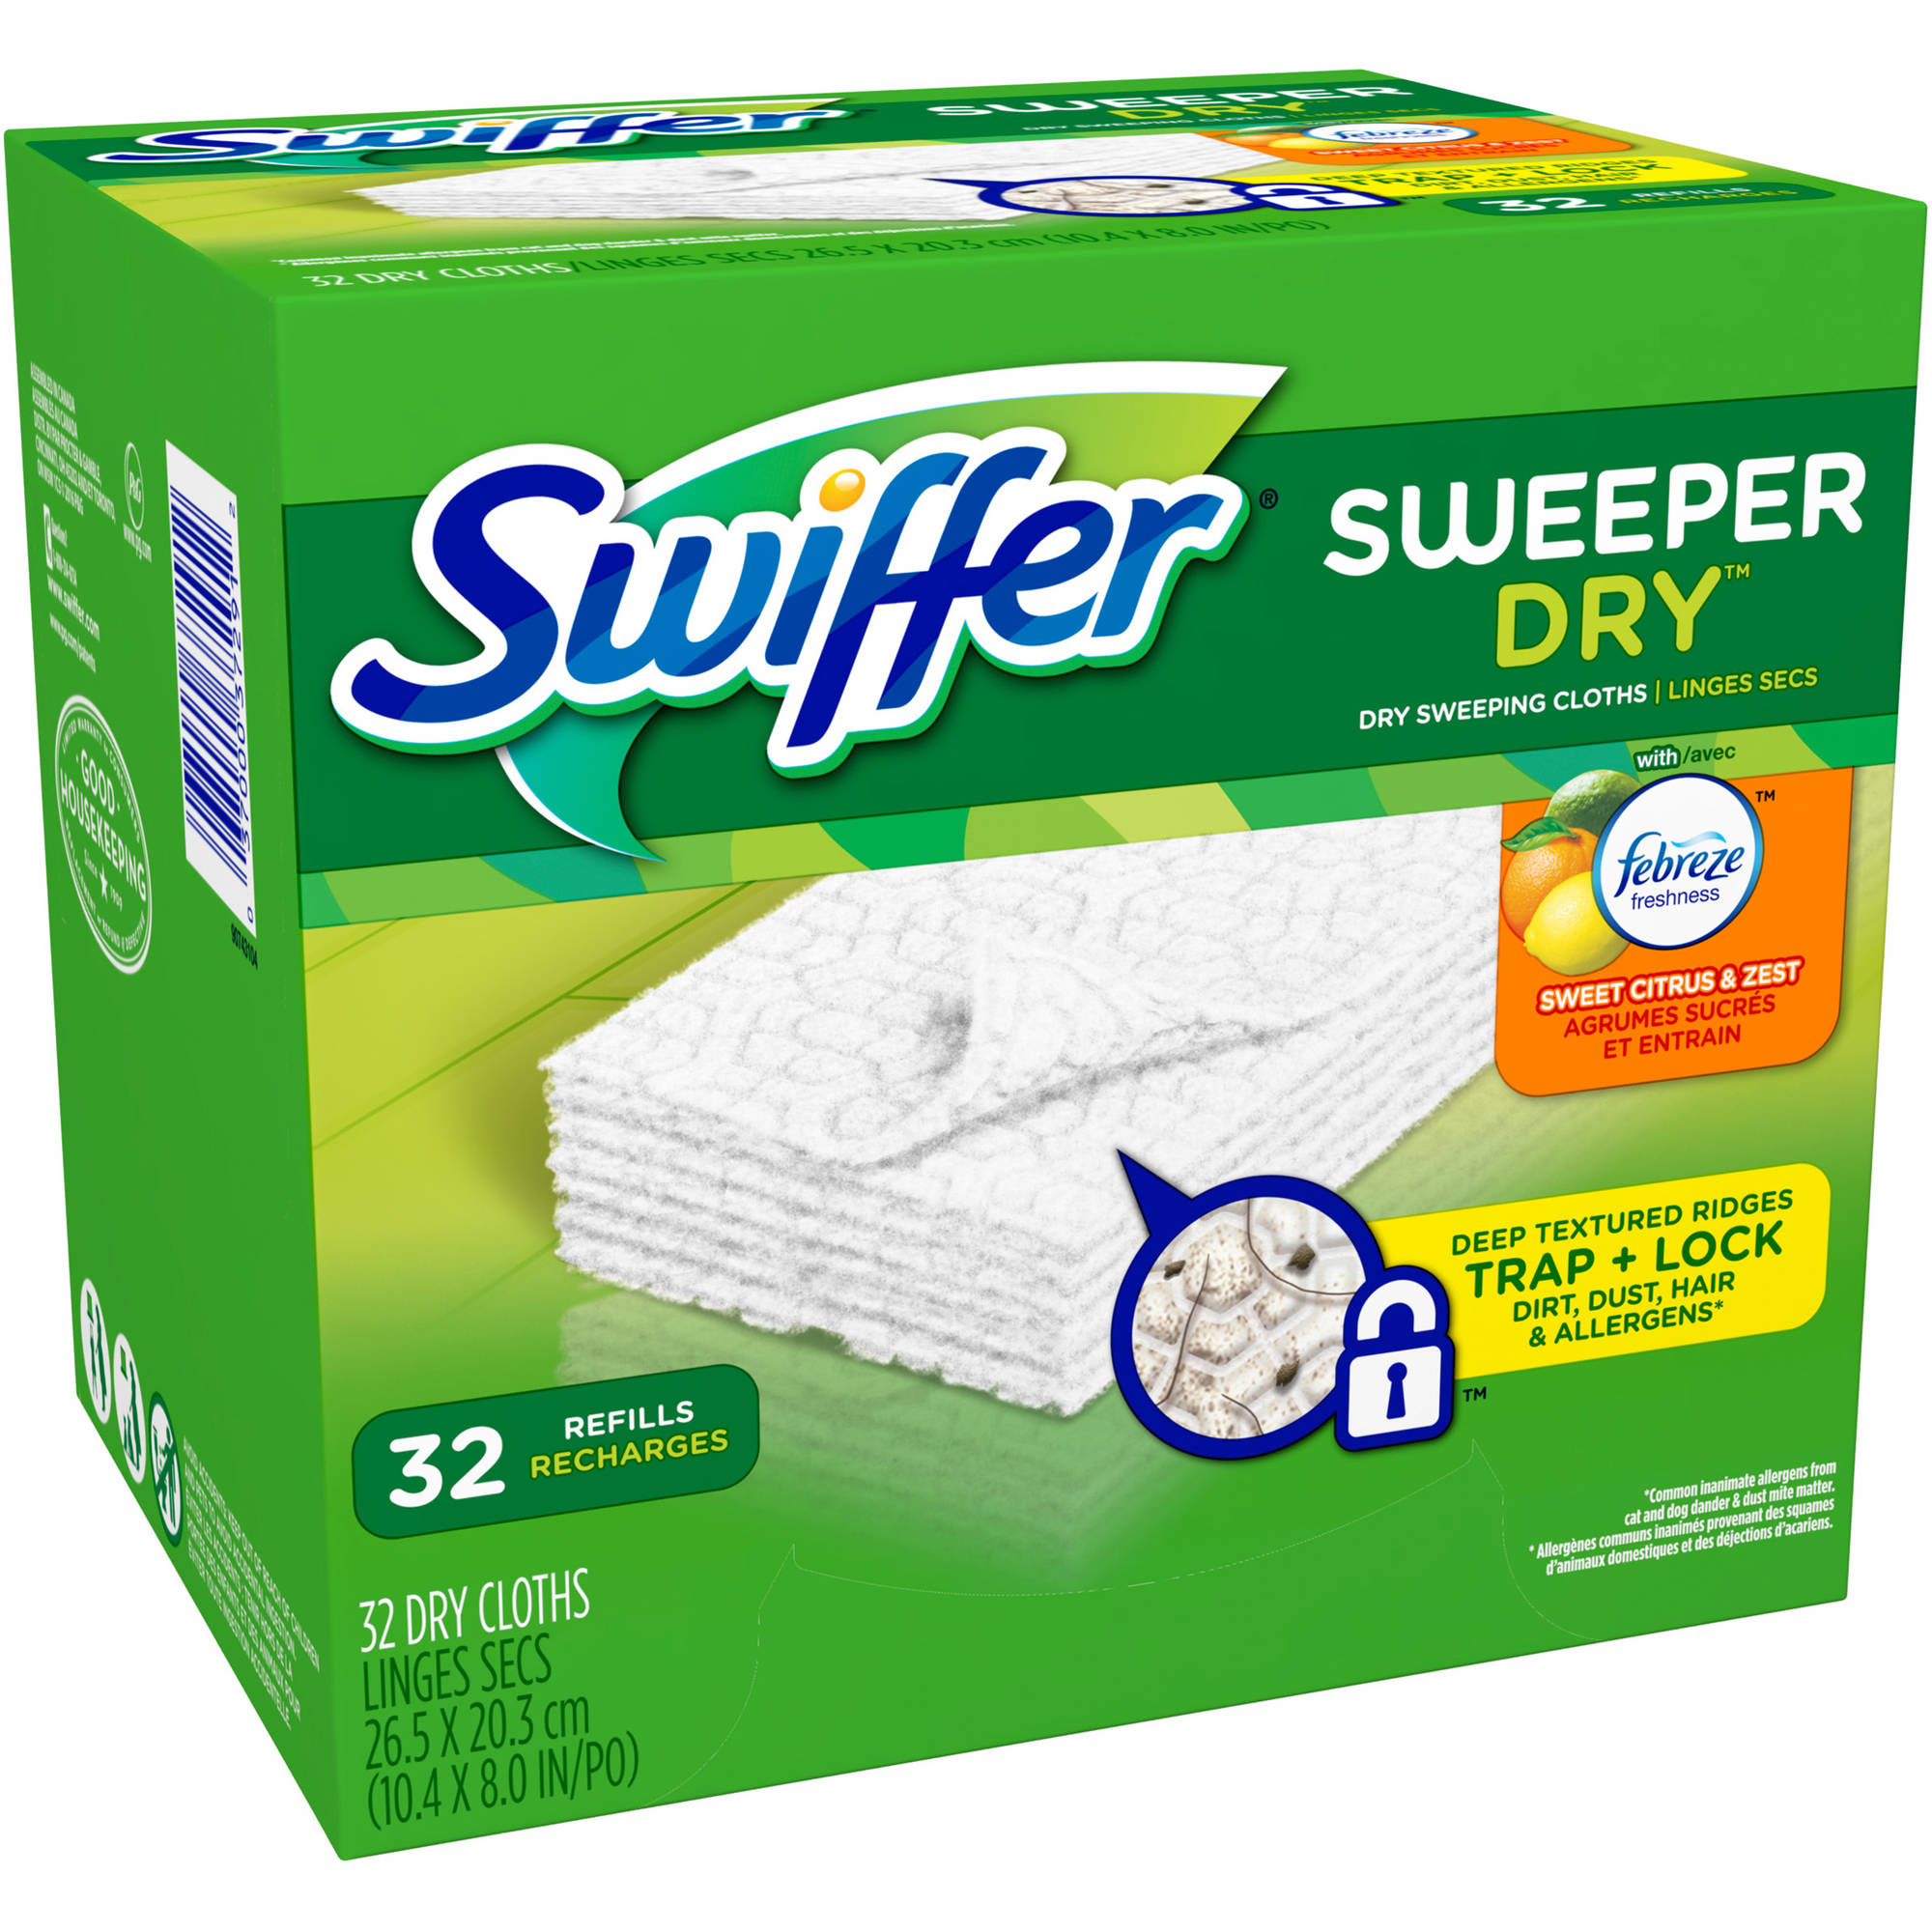 Swiffer Sweeper Vacuum Supply Dry Sweeping Refills, Citrus & Light, 32 ct